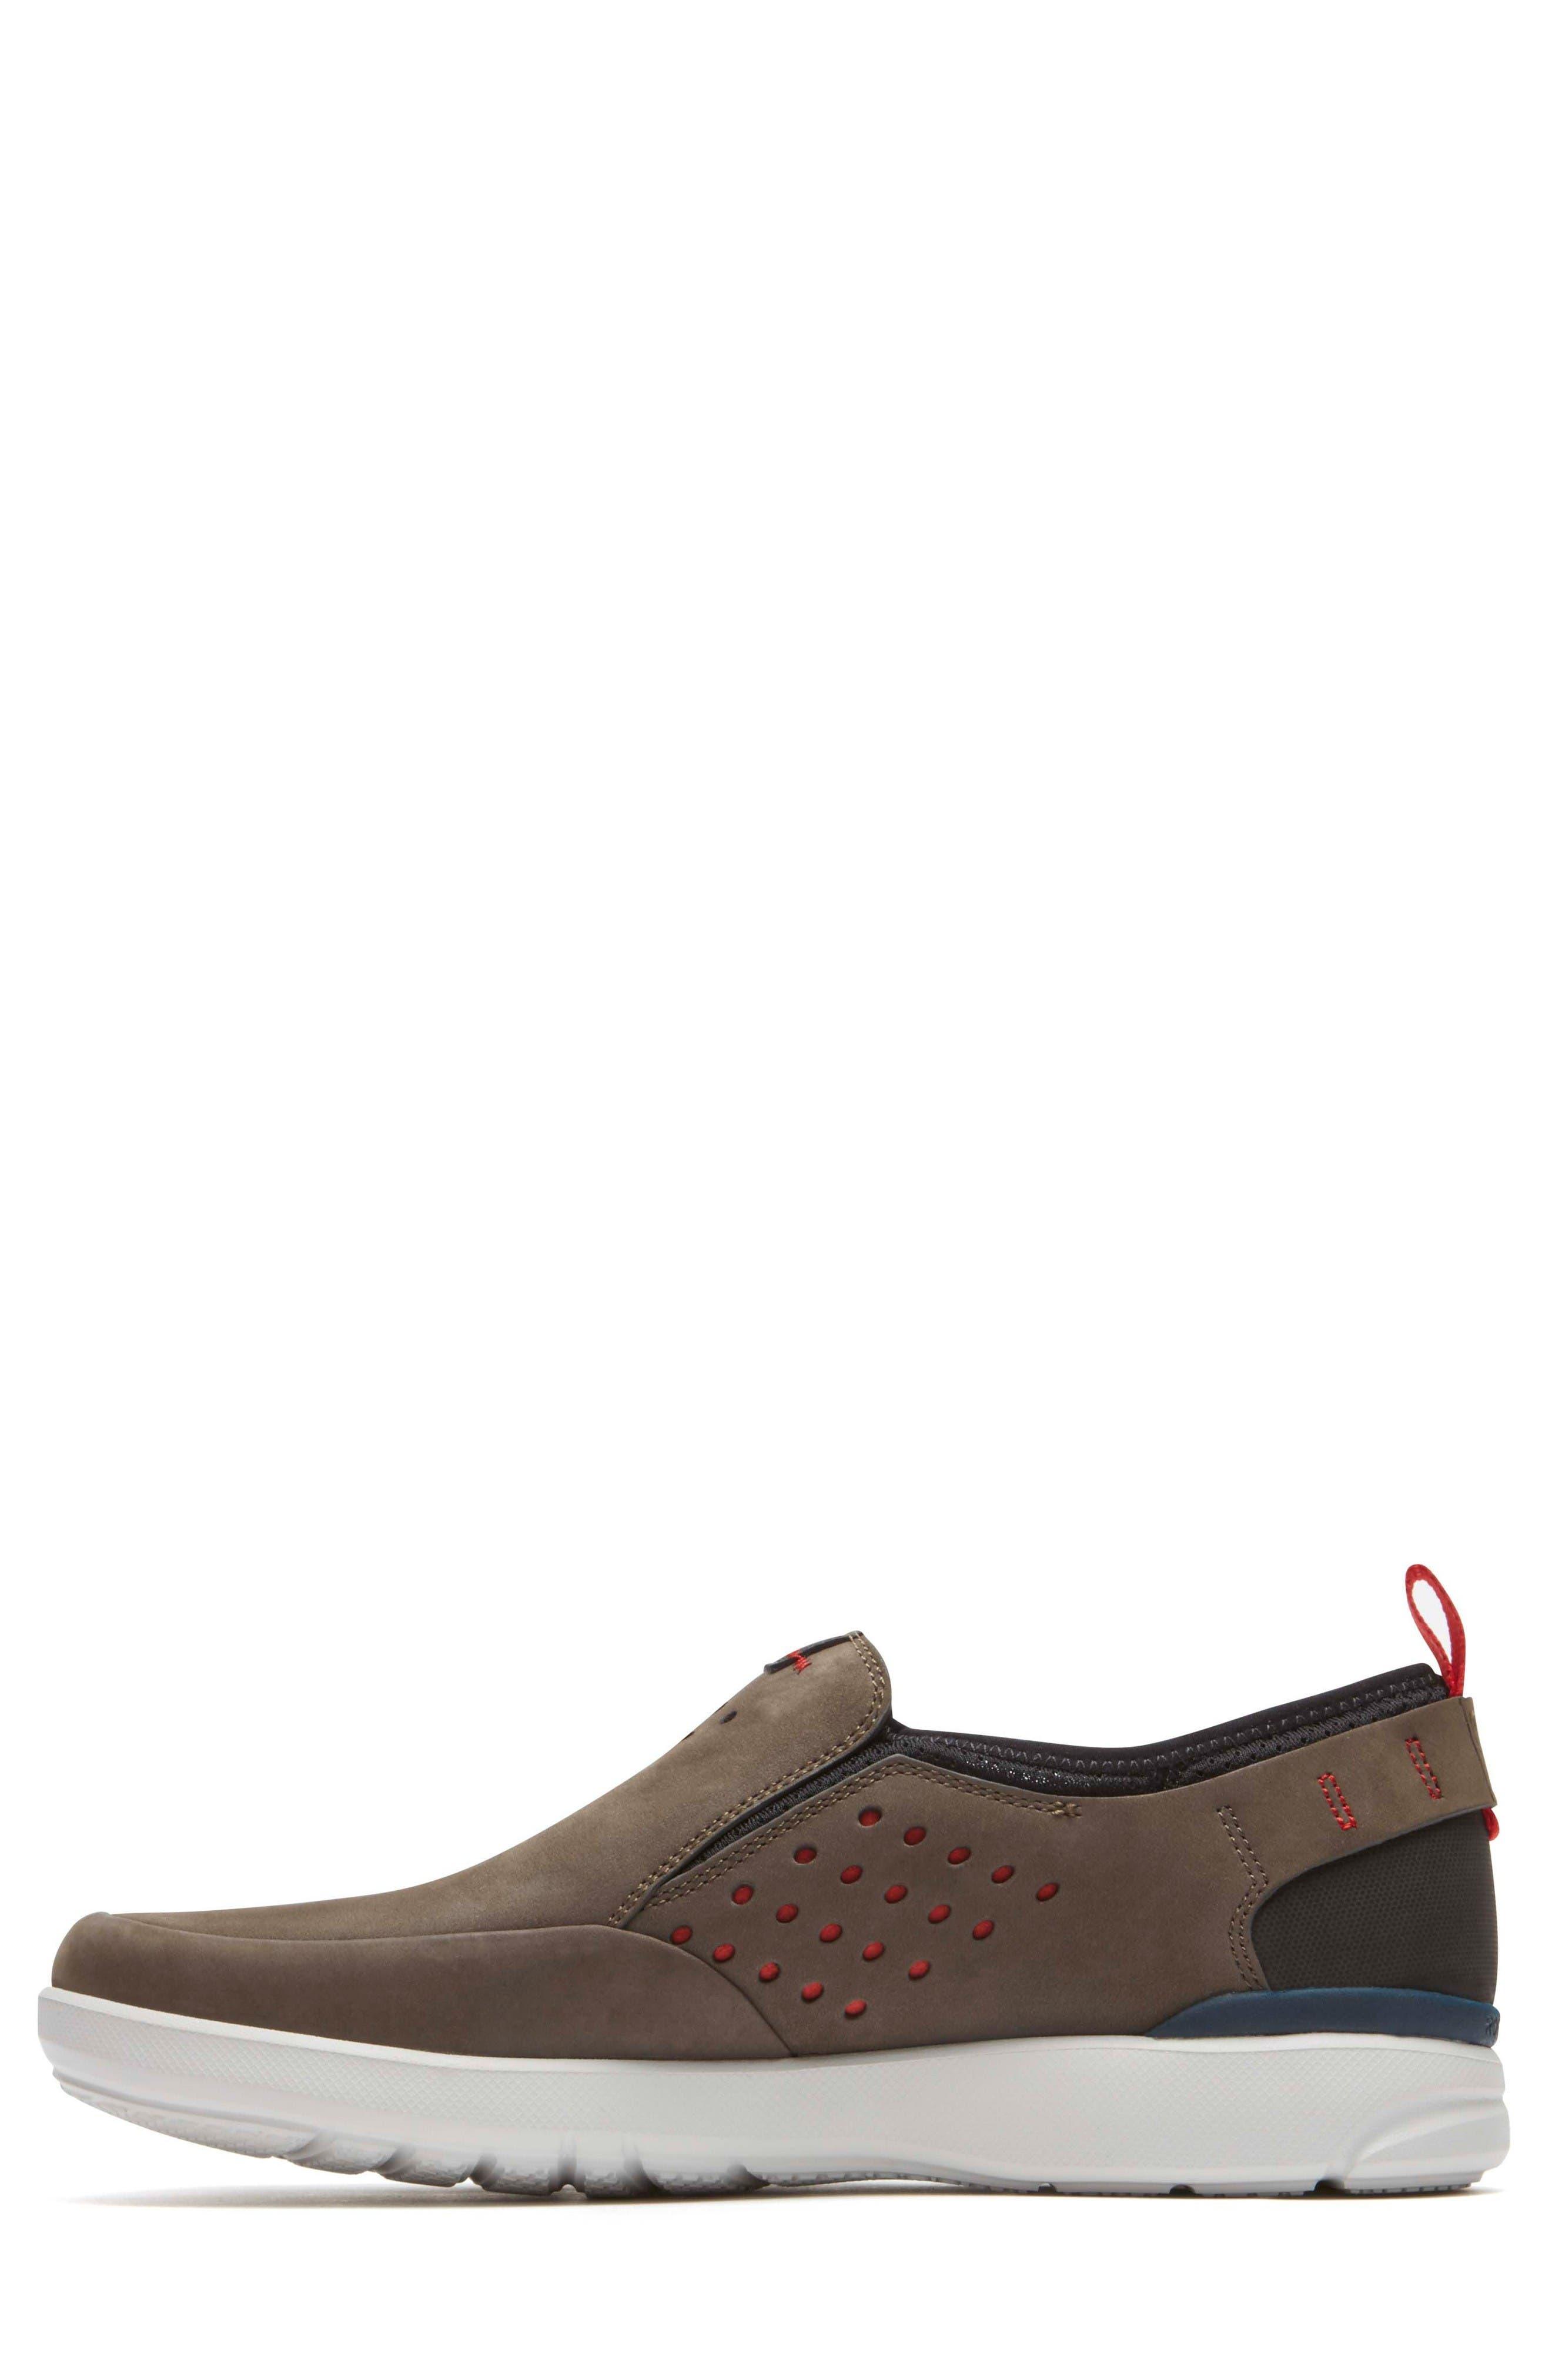 Truflex Slip-On,                             Alternate thumbnail 2, color,                             Dark Olive Leather